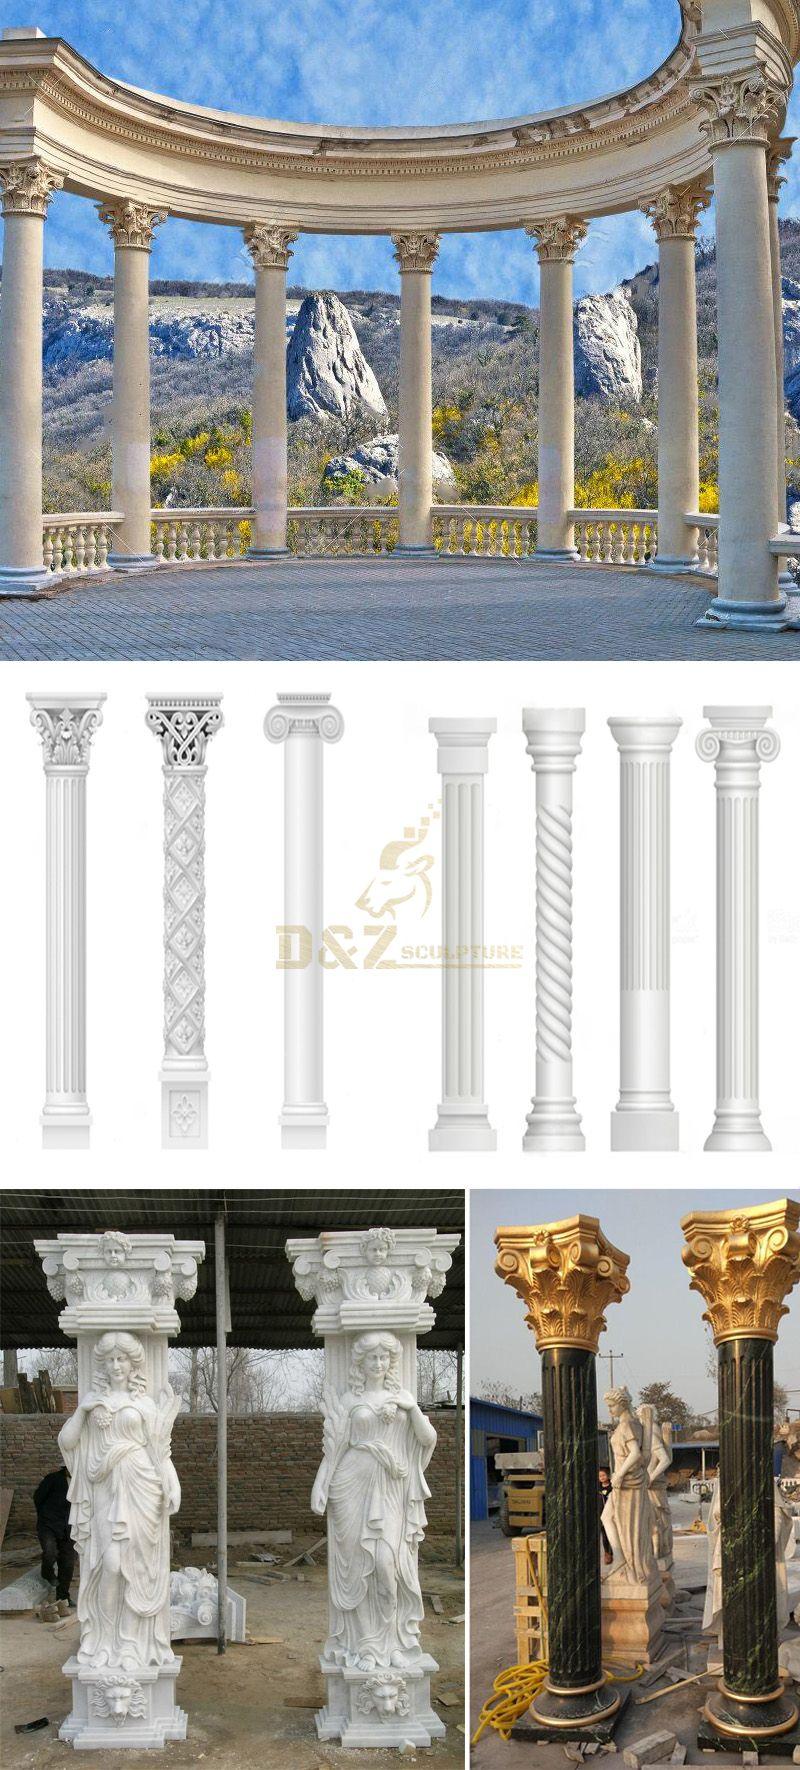 Building And Decoration White Stone Roman Columns